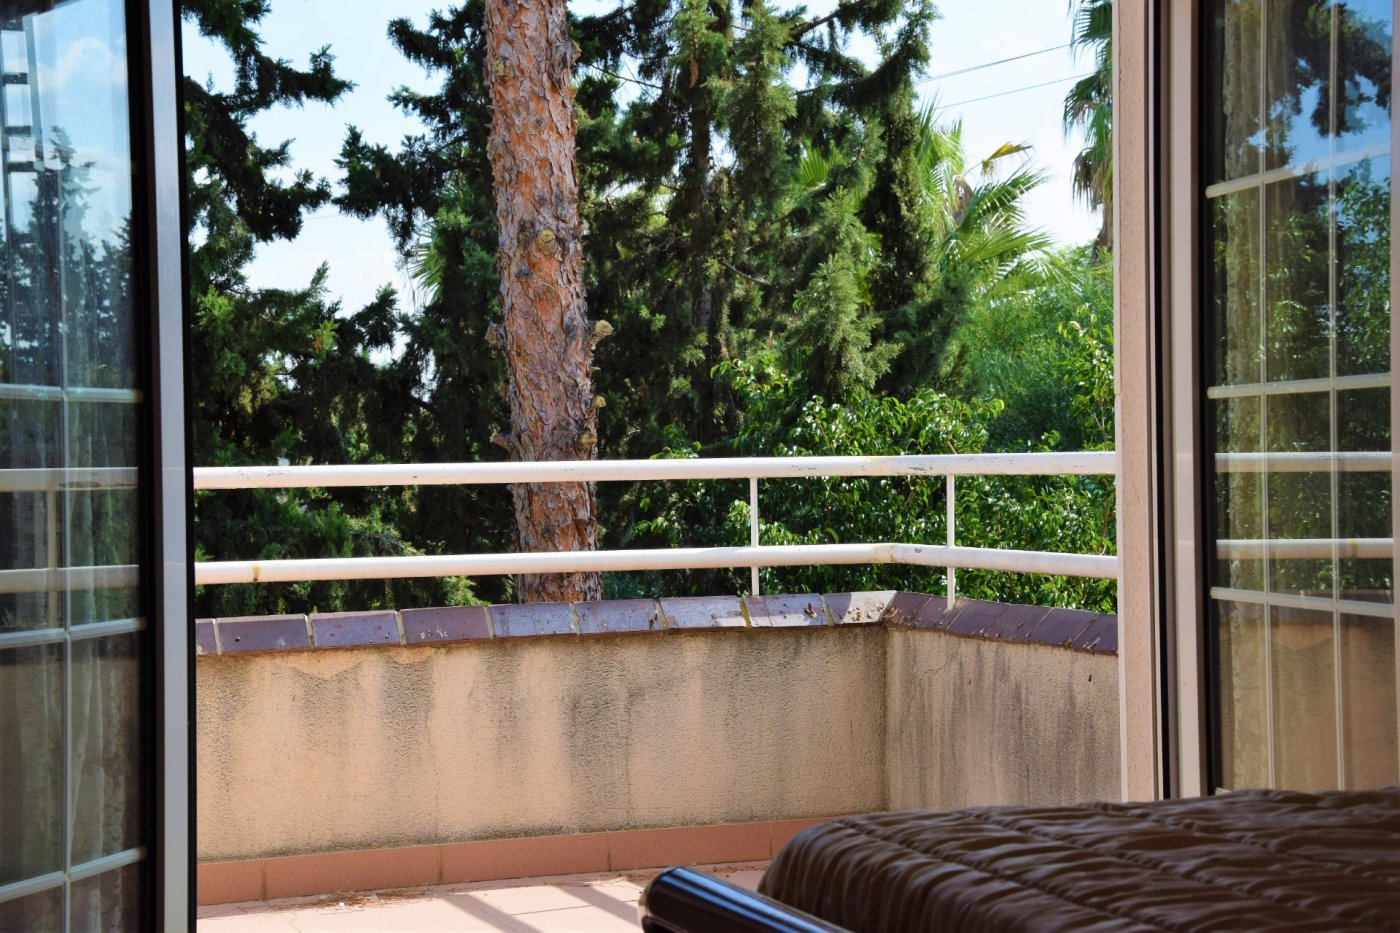 Chalet en Murcia www.joaquincarceles.com JC174 (32)